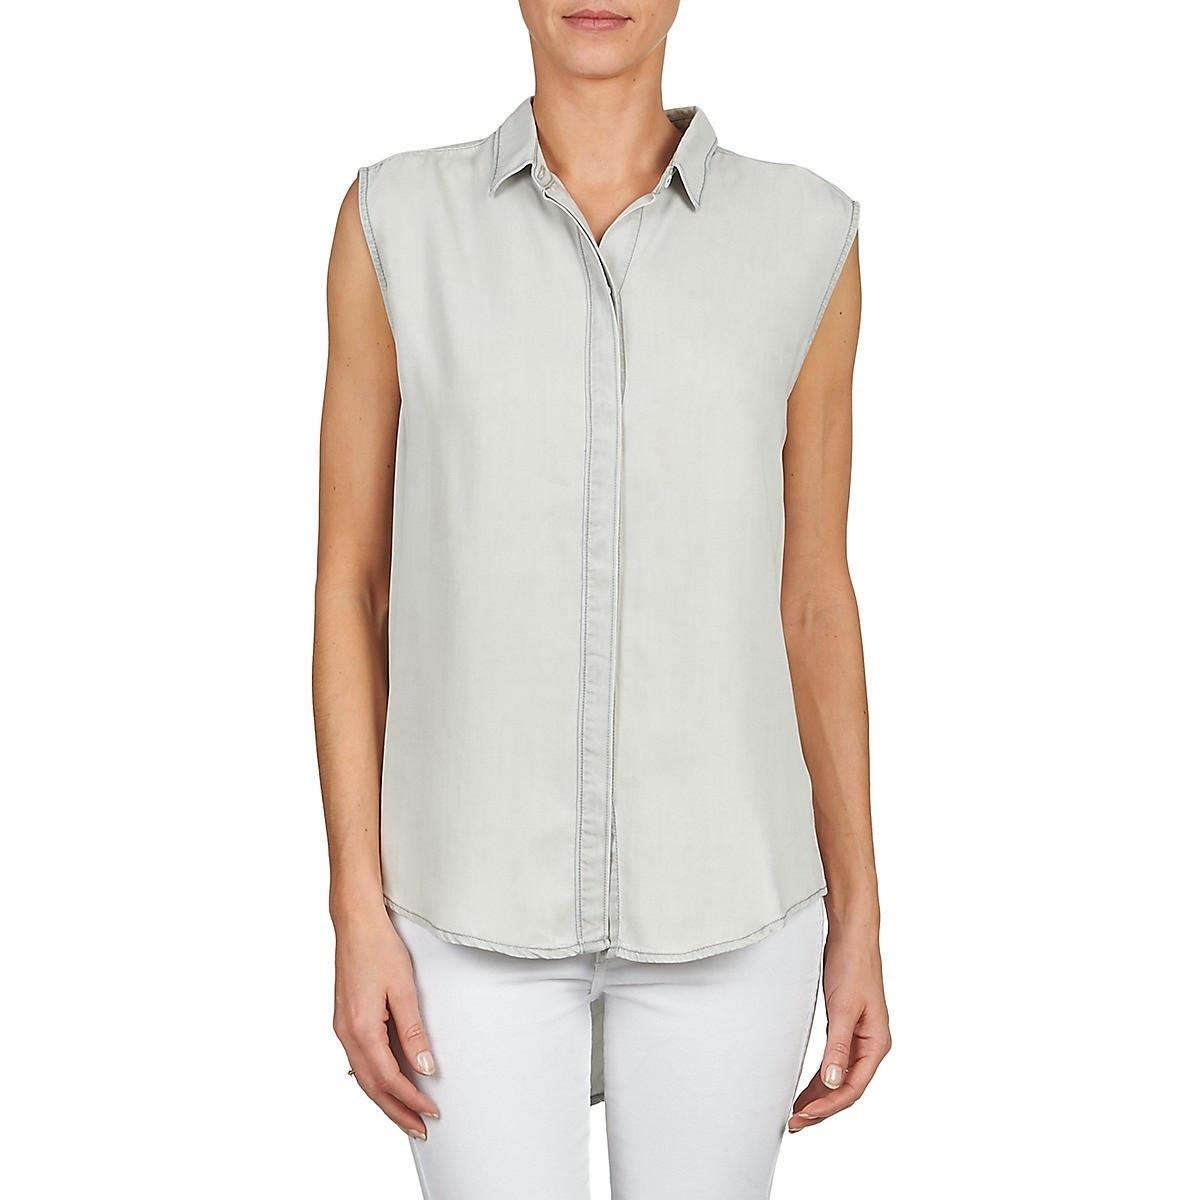 Calvin Klein Calvin Klein dámský světlý denim top bez rukávů